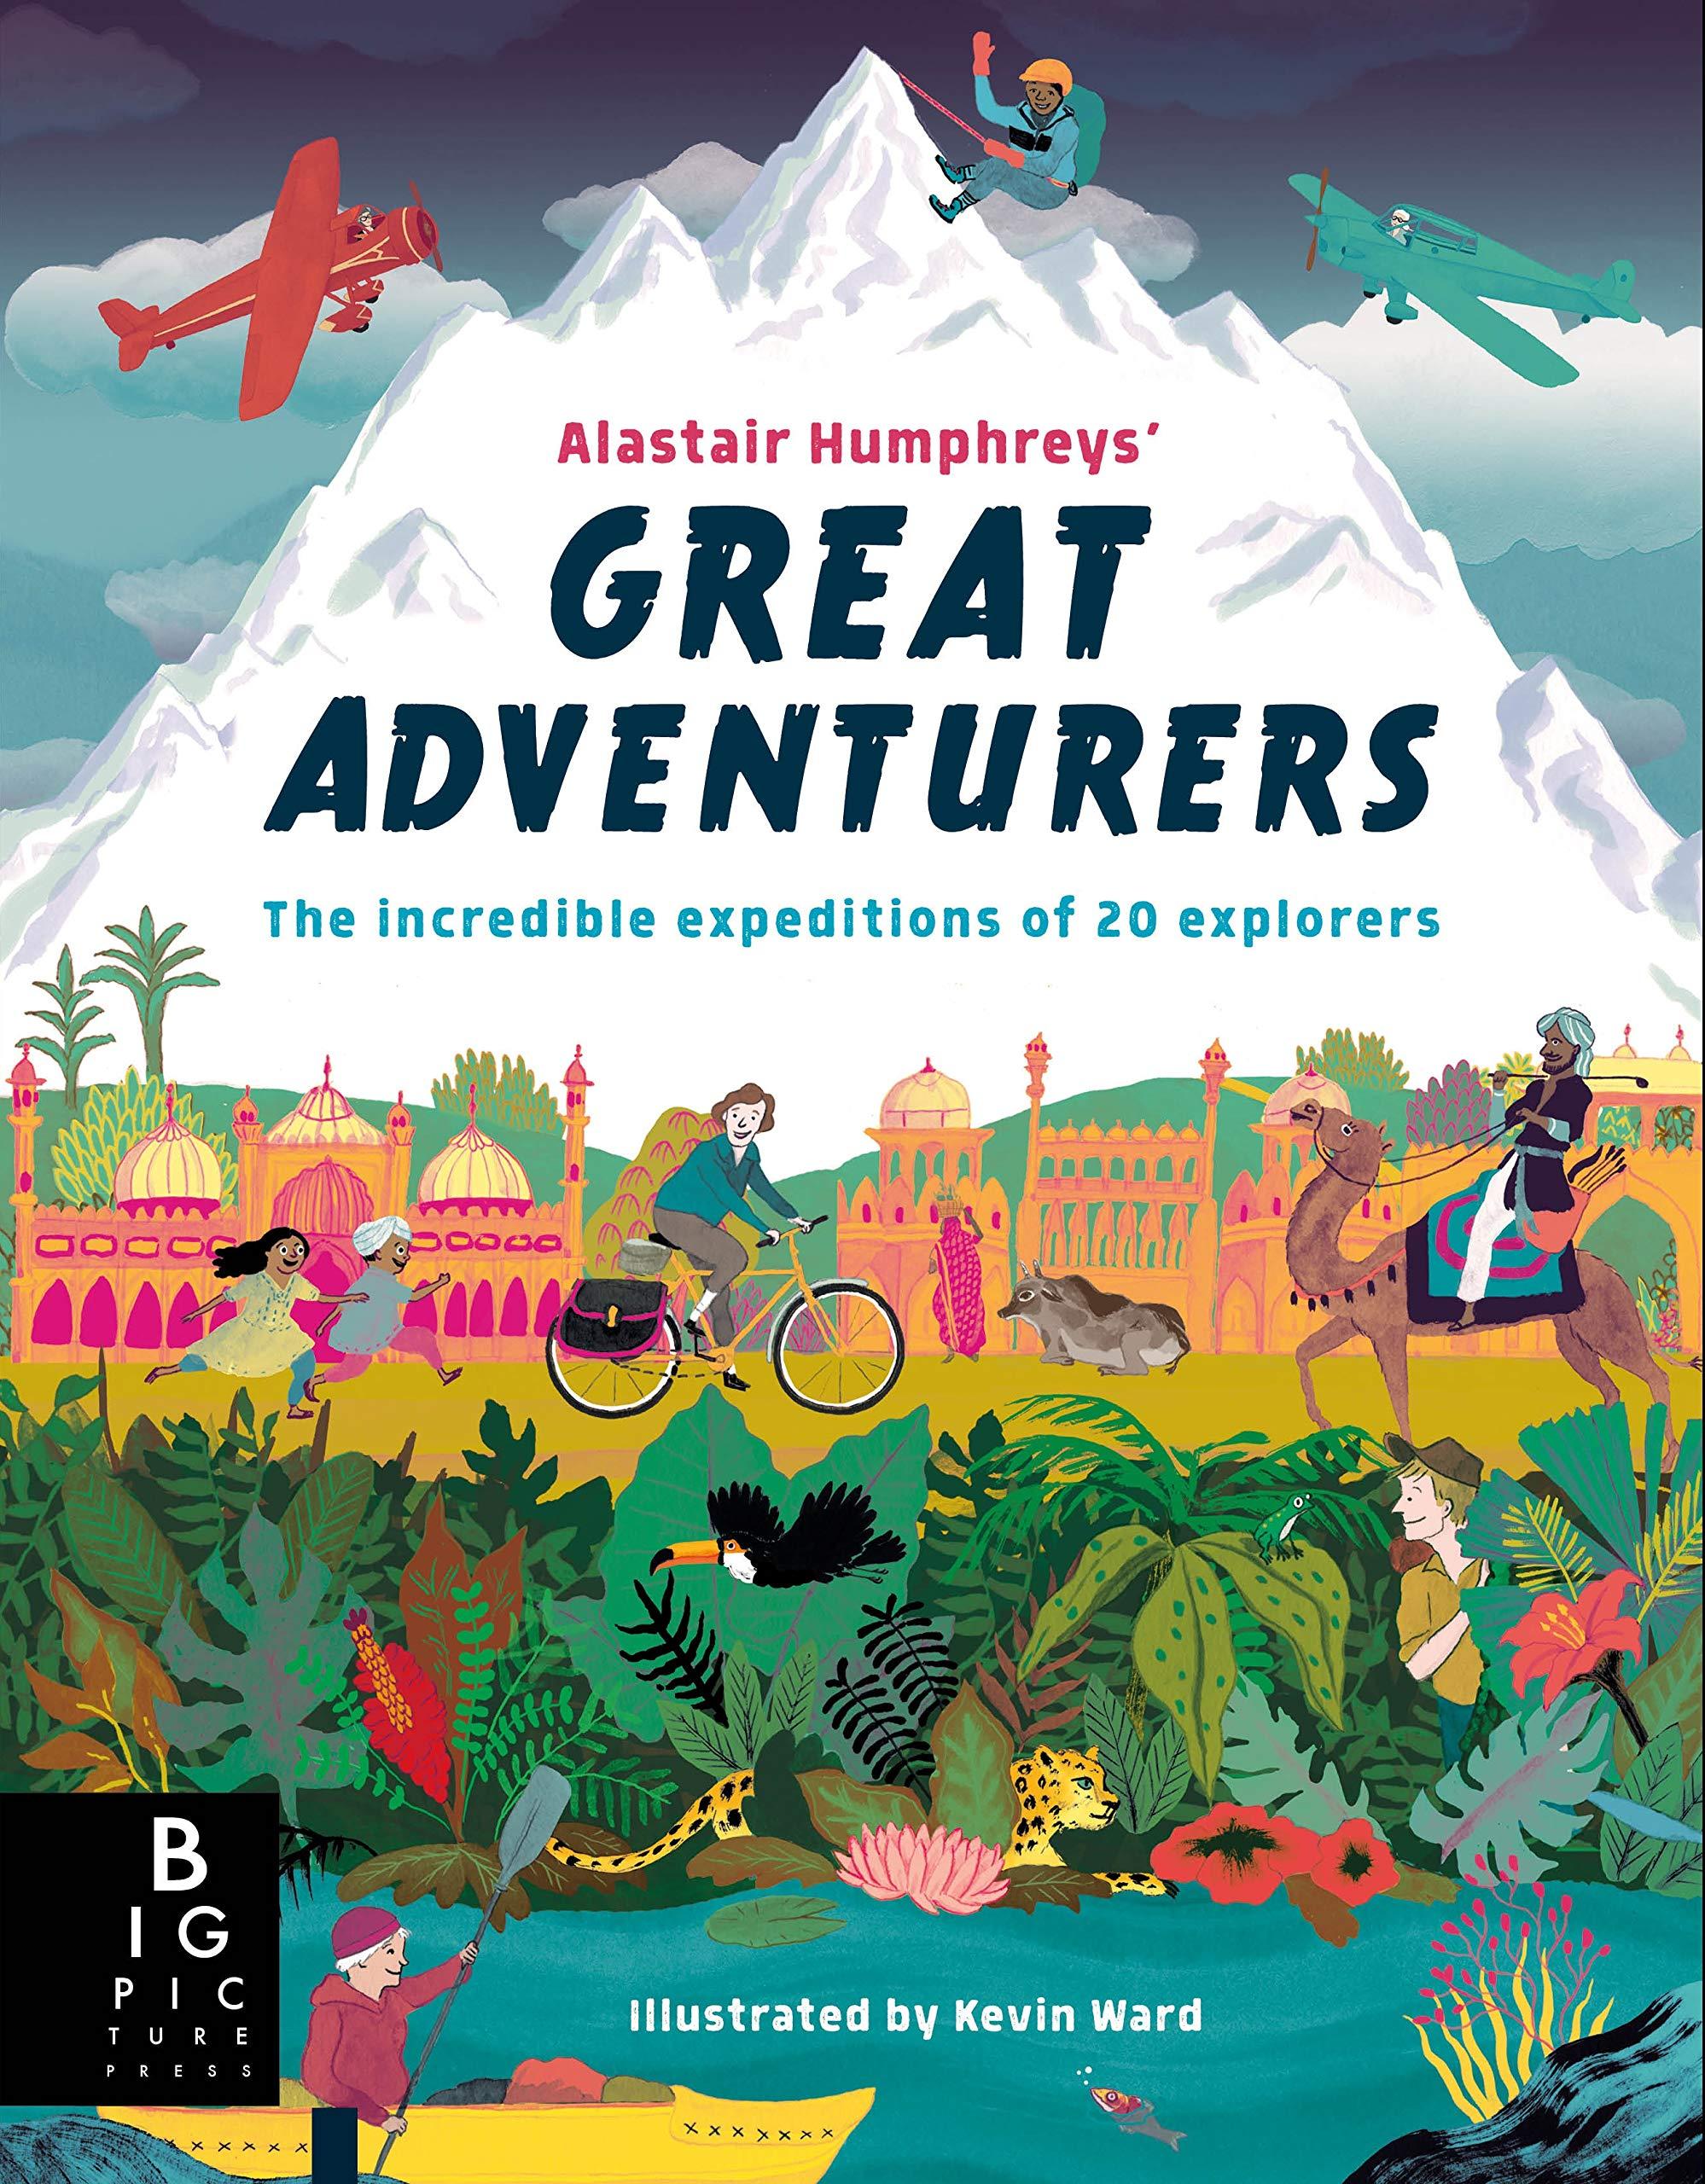 Alastair Humphreys' Great Adventurers: Amazon.co.uk: Humphreys, Alastair,  Ward, Kevin: Books